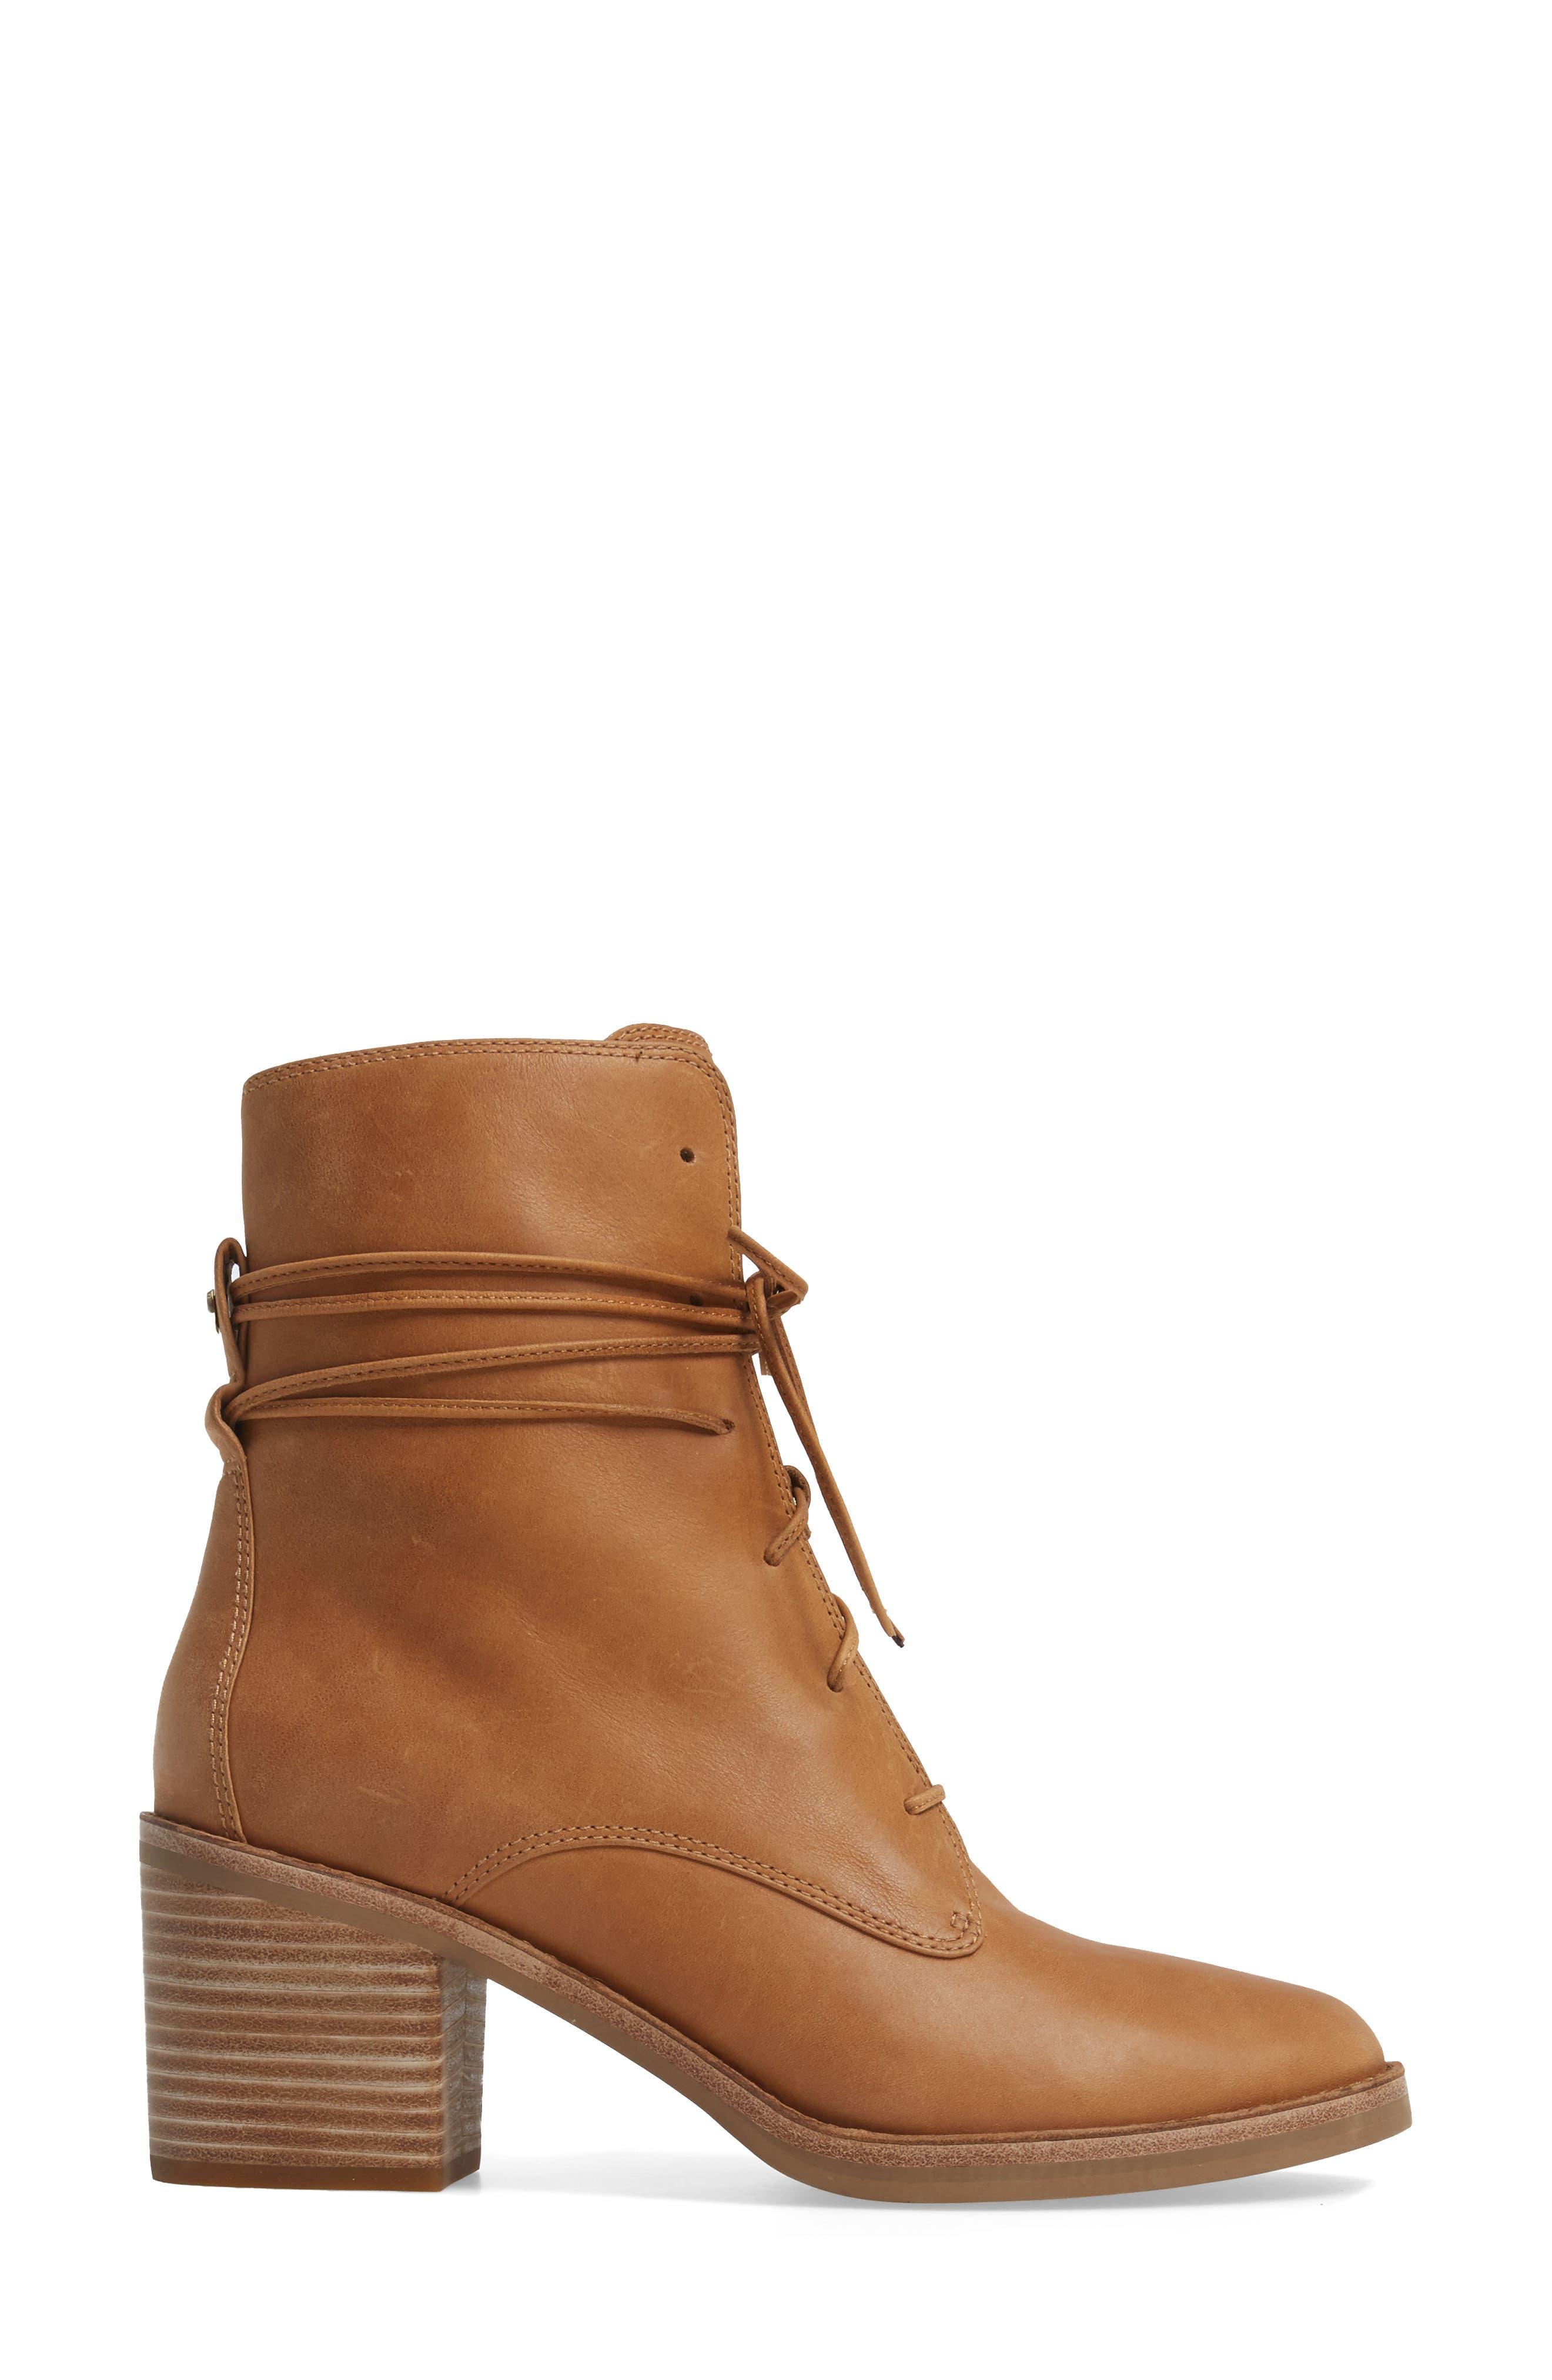 Alternate Image 3  - UGG® Oriana Lace-Up Boot (Women)